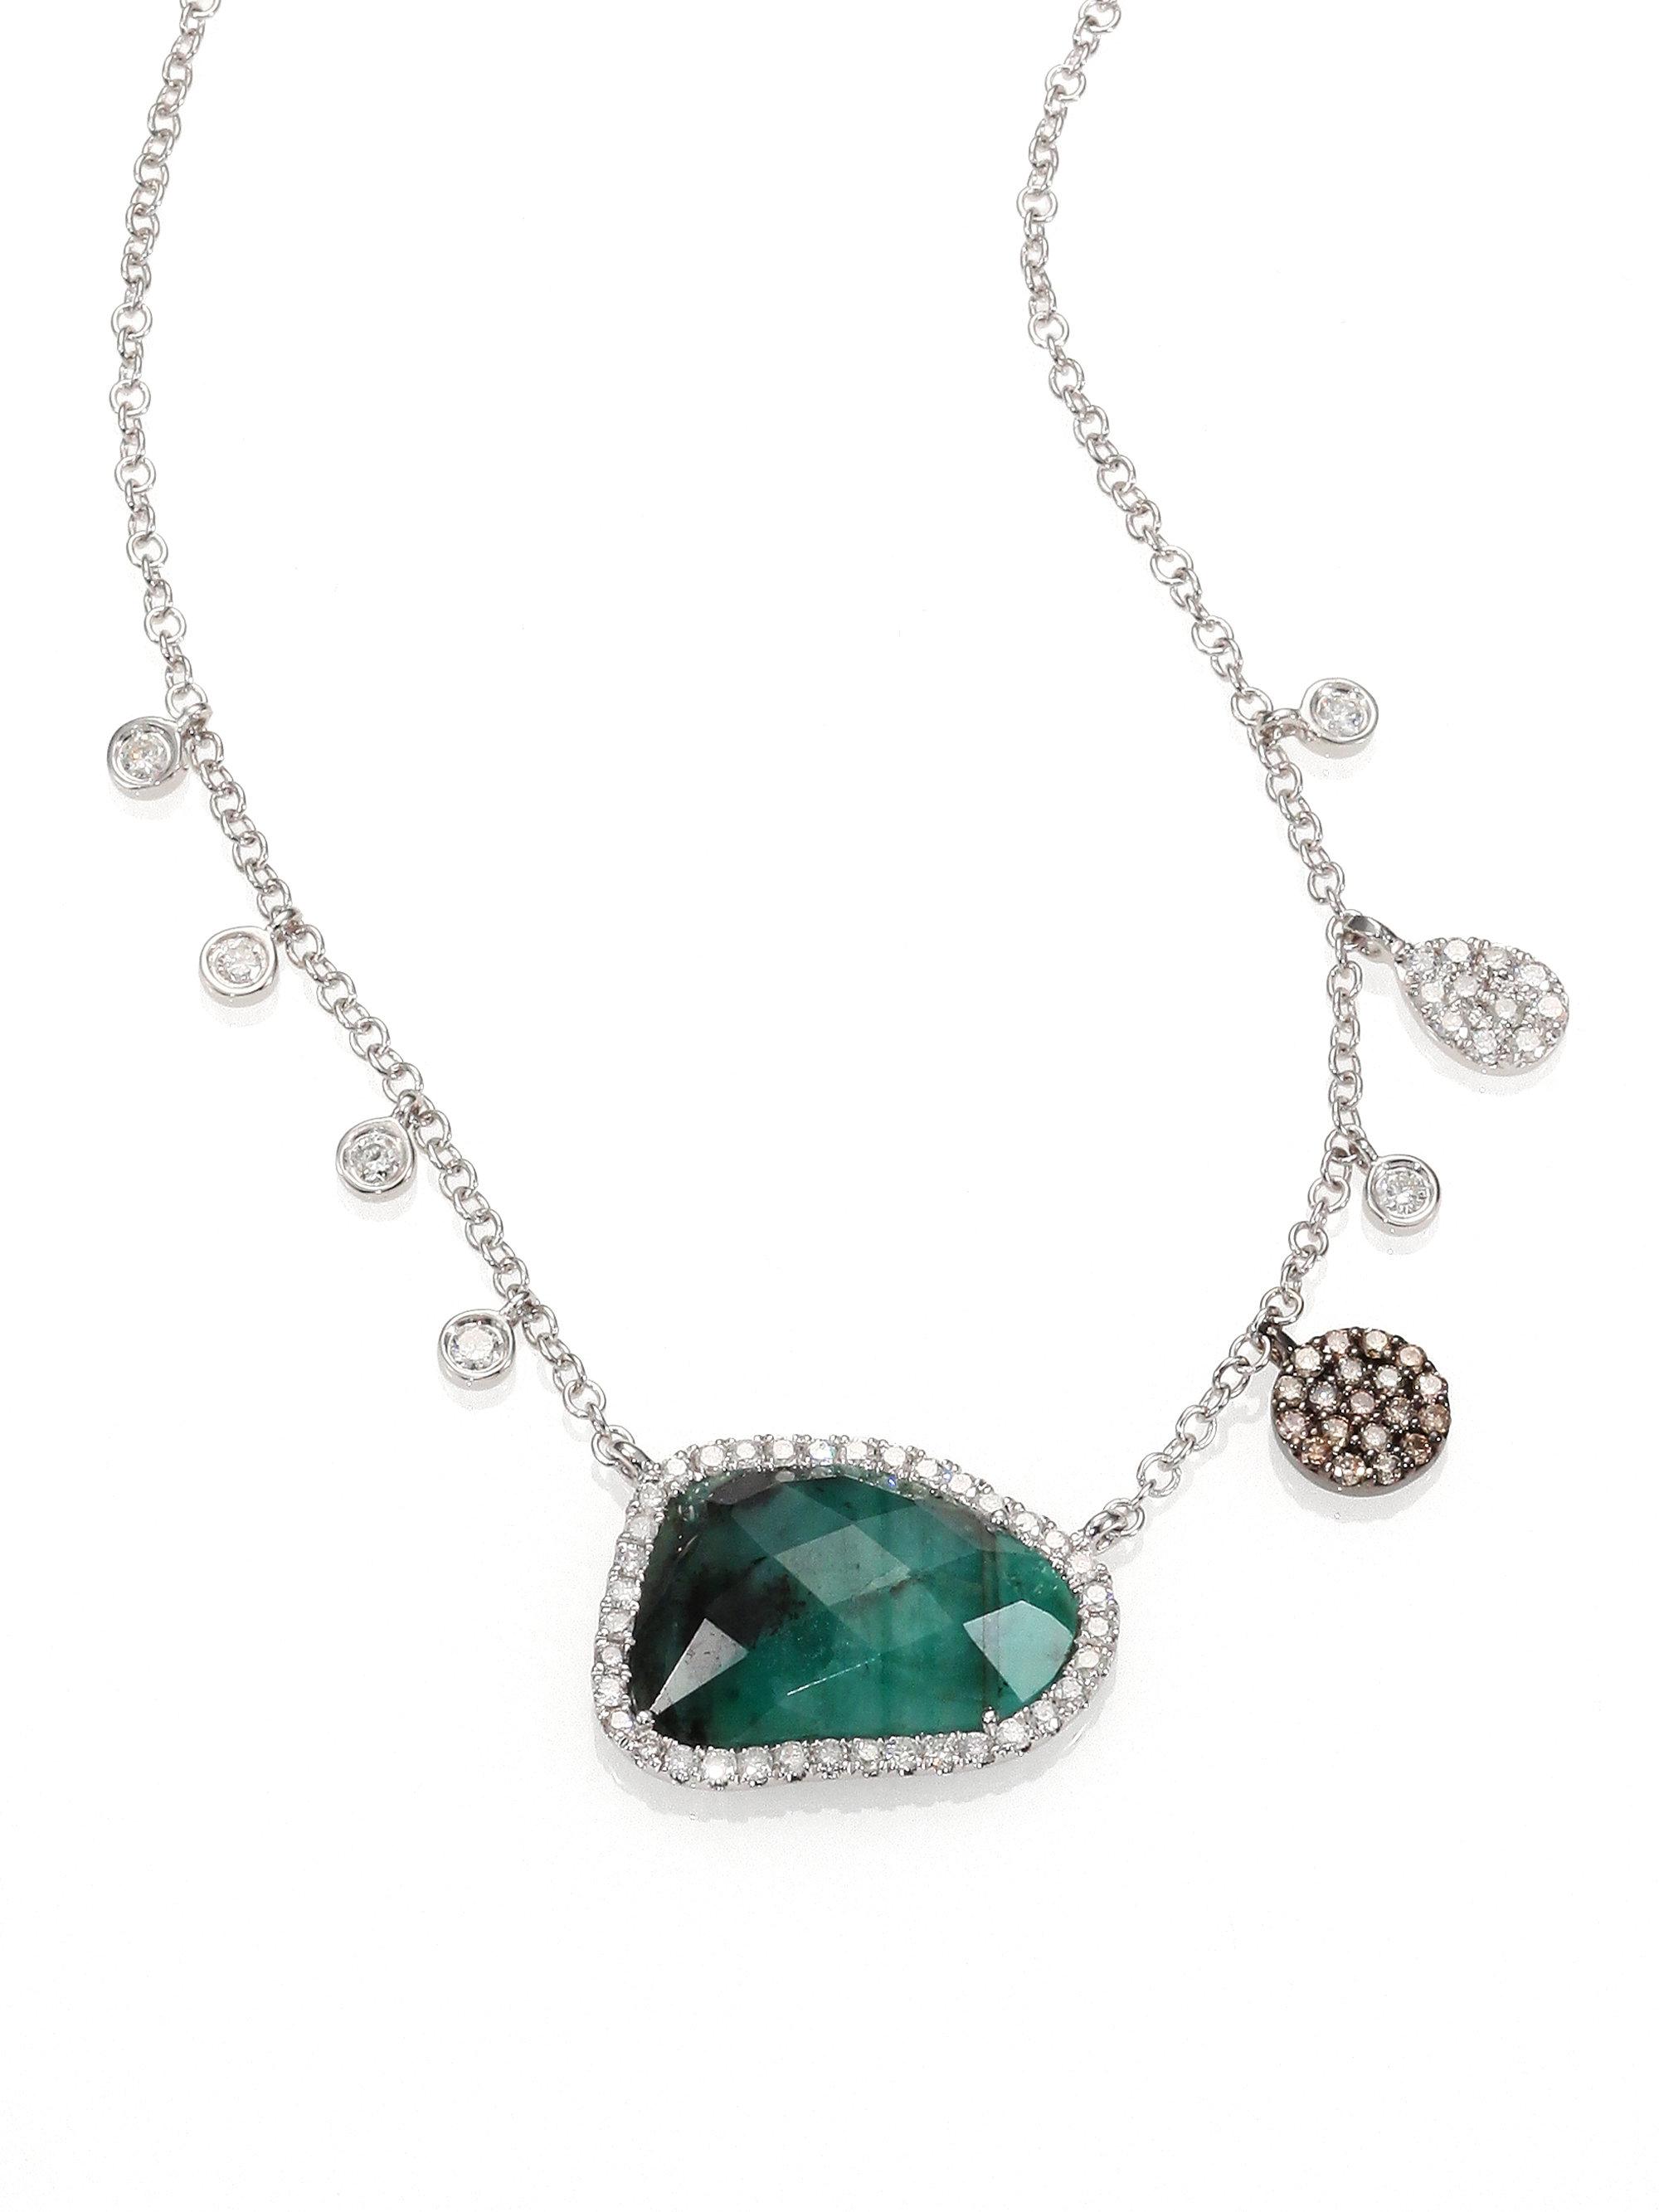 Meira t Emerald Diamond 14k White Gold Pendant Necklace in